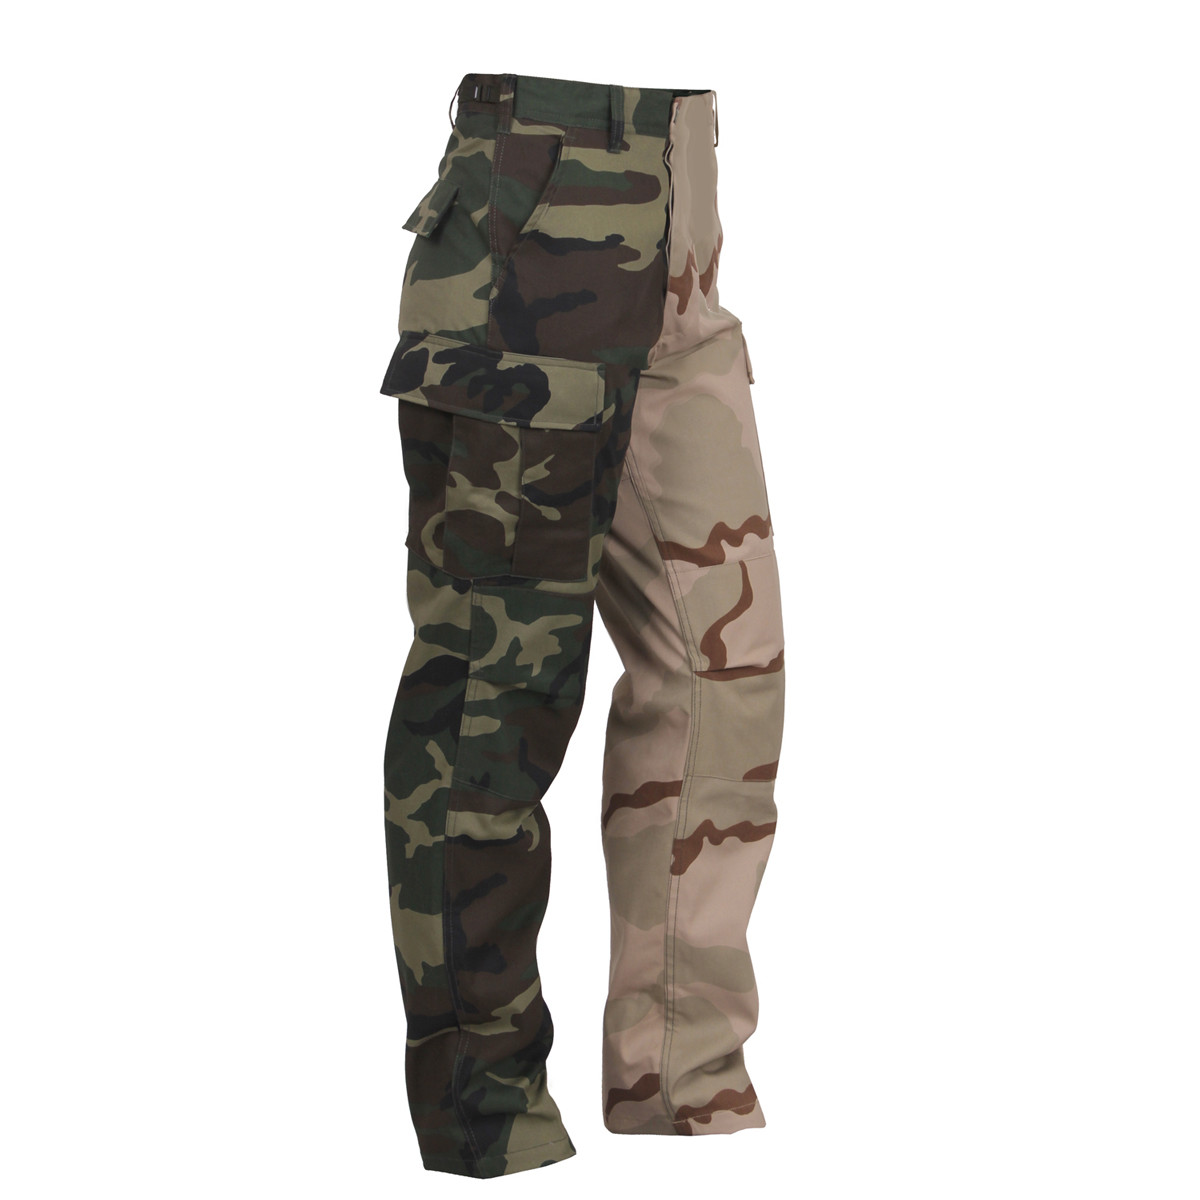 7ec4228306 Shop Two Tone Camo Pants - Fatigues Army Navy Gear